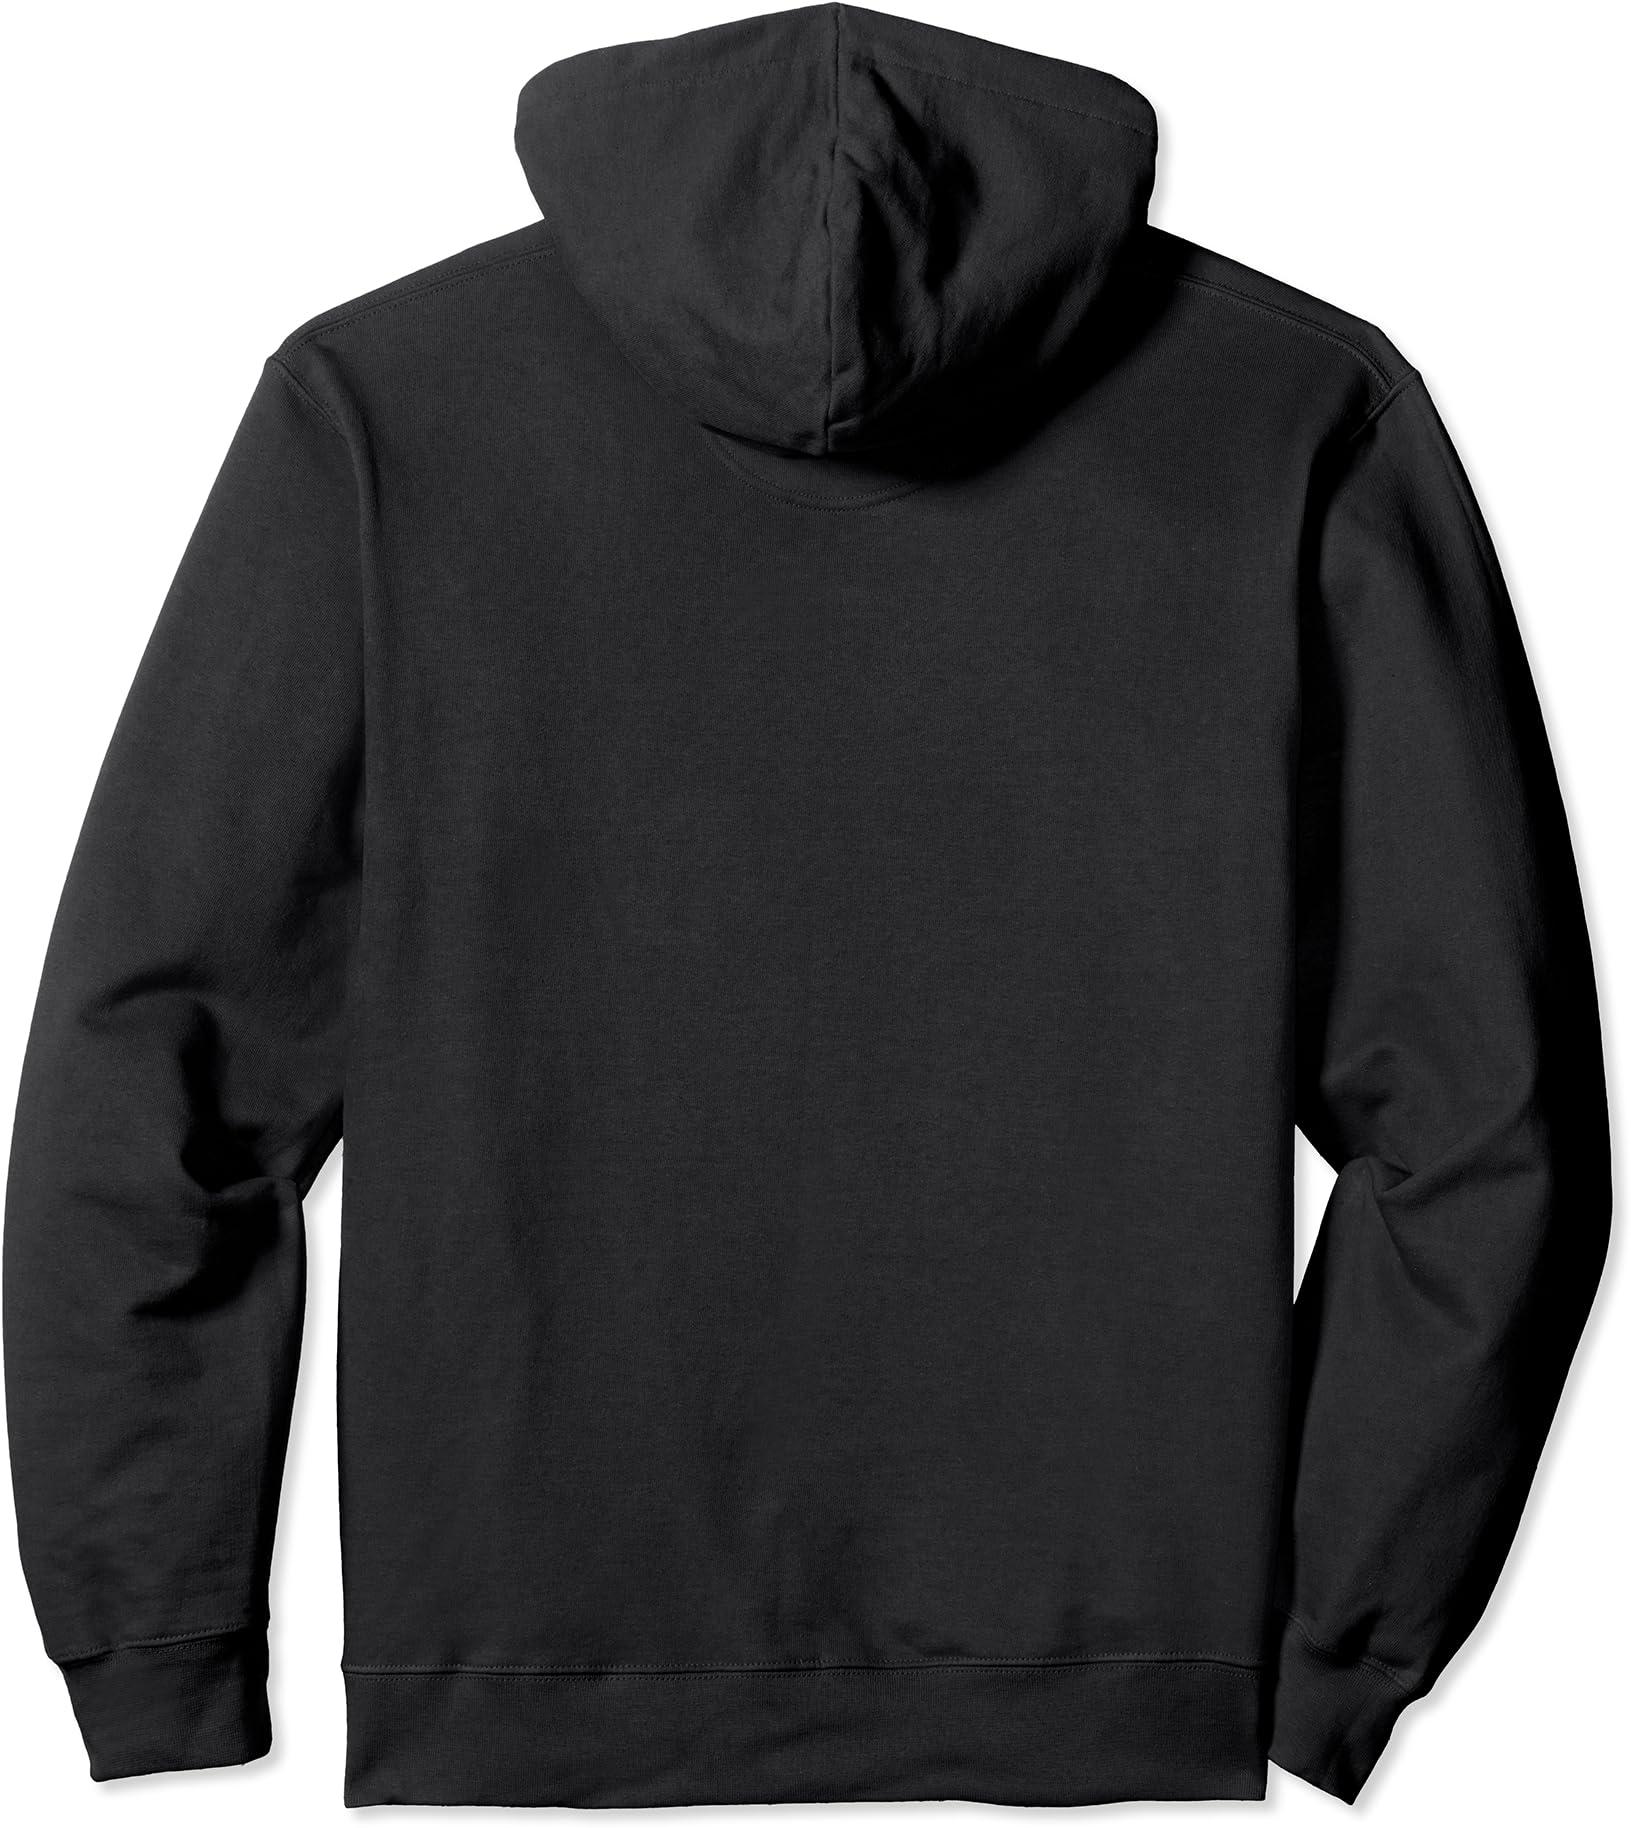 Optumus American Flag Kids Sweatshirts Long Sleeve T Shirt Boy Girl Children Teenagers Unisex Tee